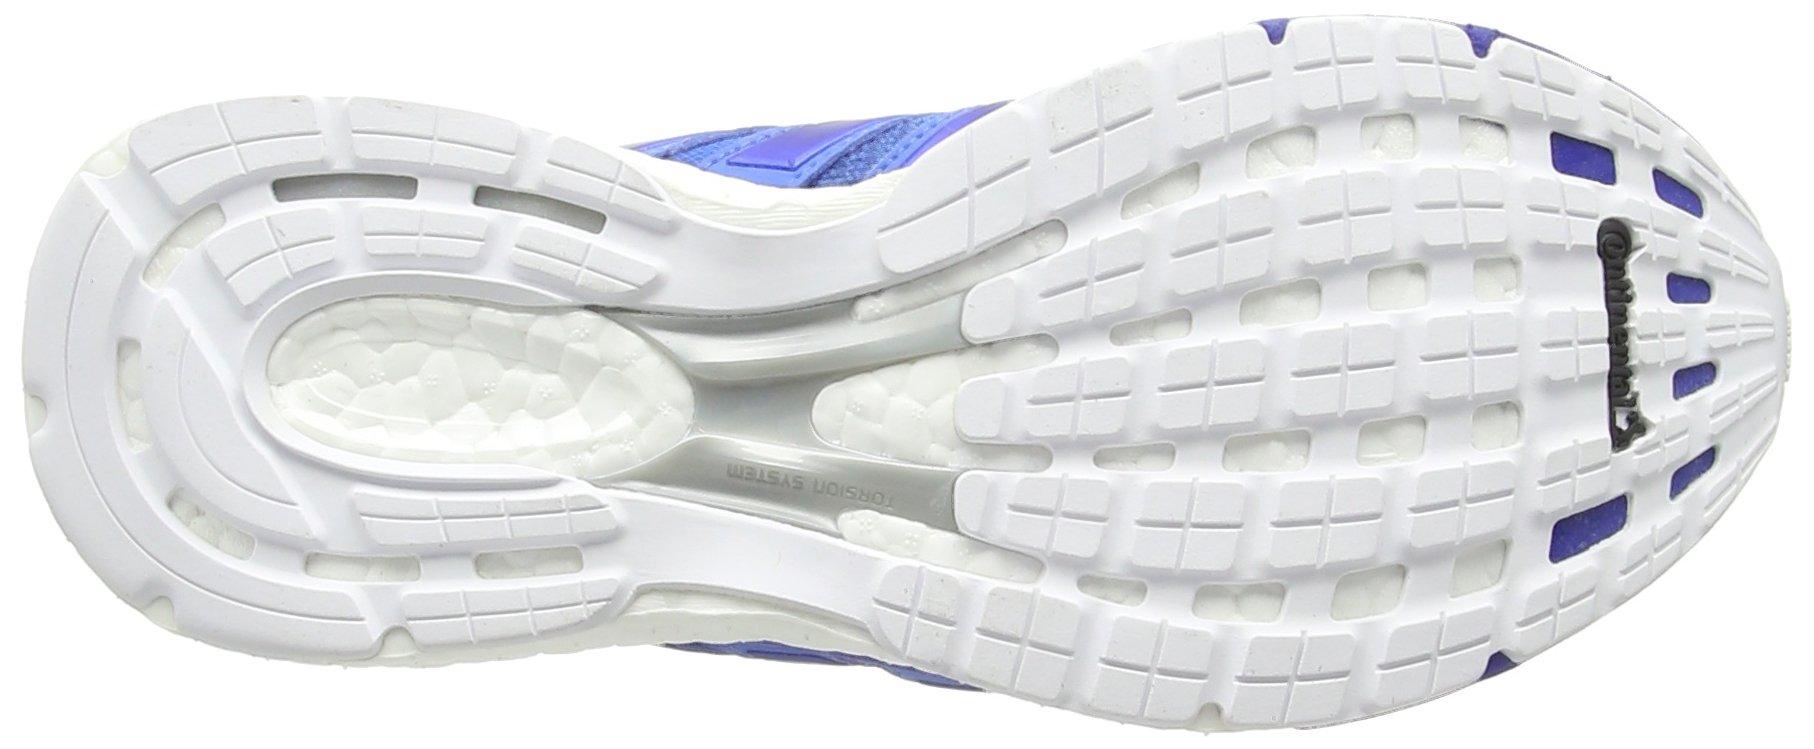 61OTNfw48mL - adidas Women's Adizero Boston 6 Competition Running Shoes